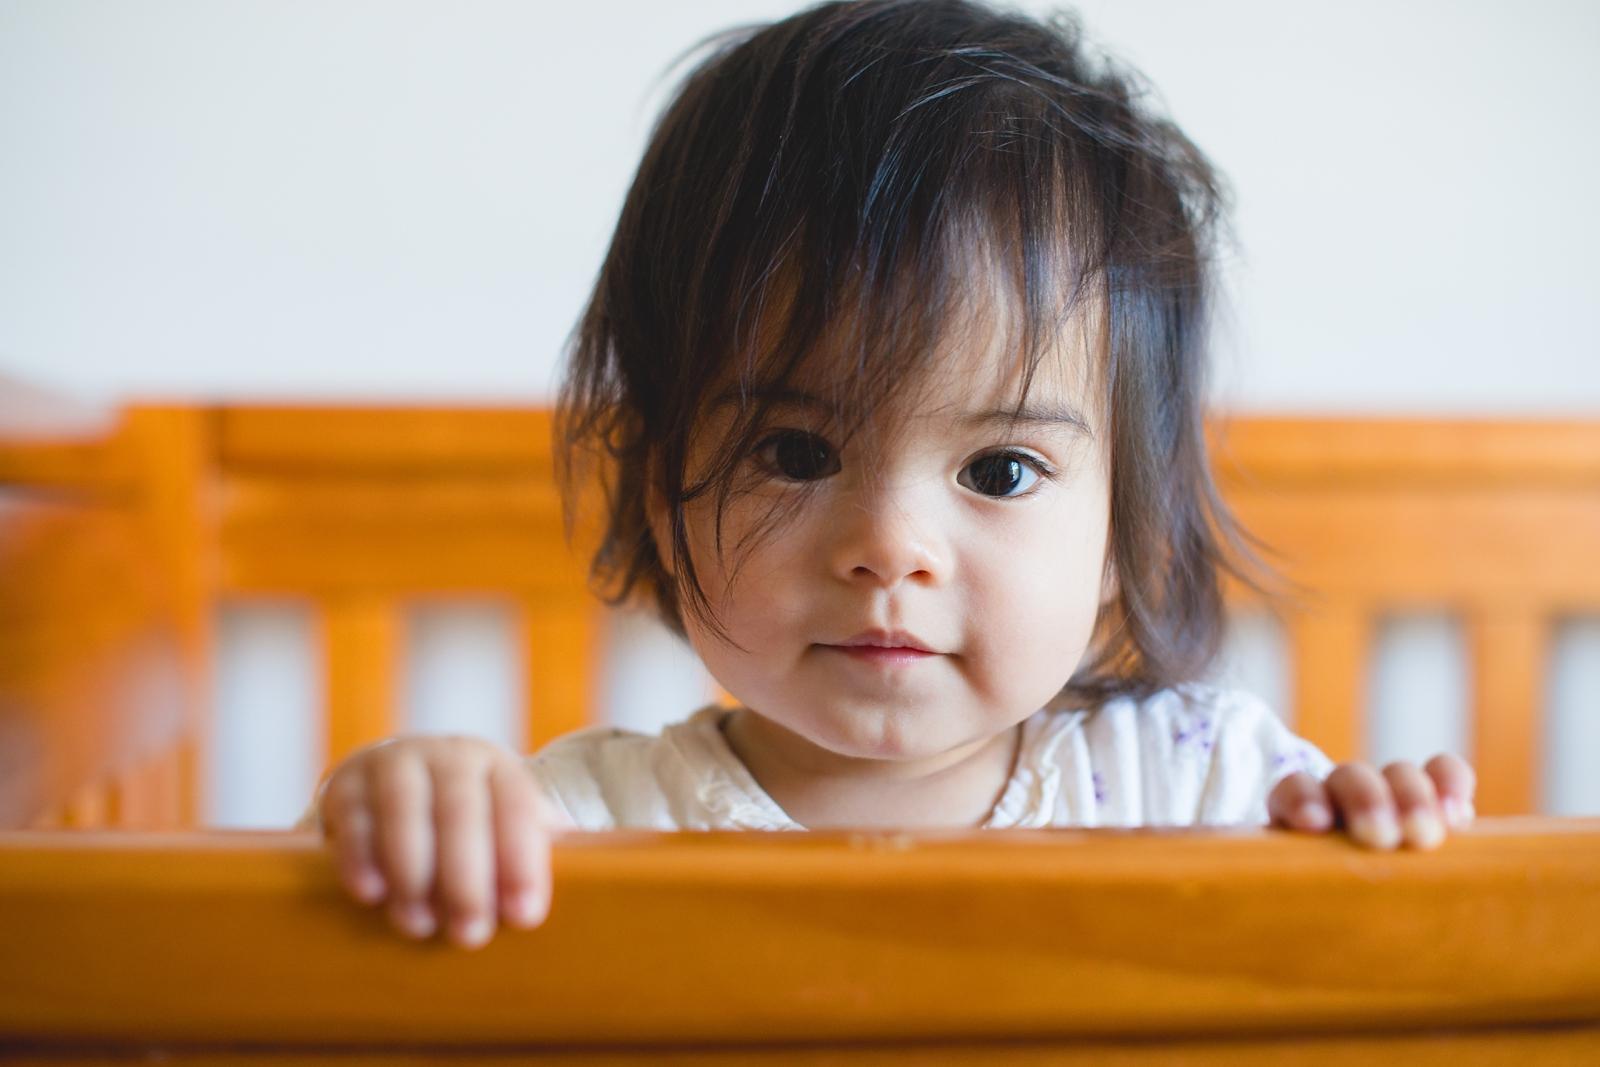 20130814-Amelia Stands in Crib-BLOGGrid_0006.jpg